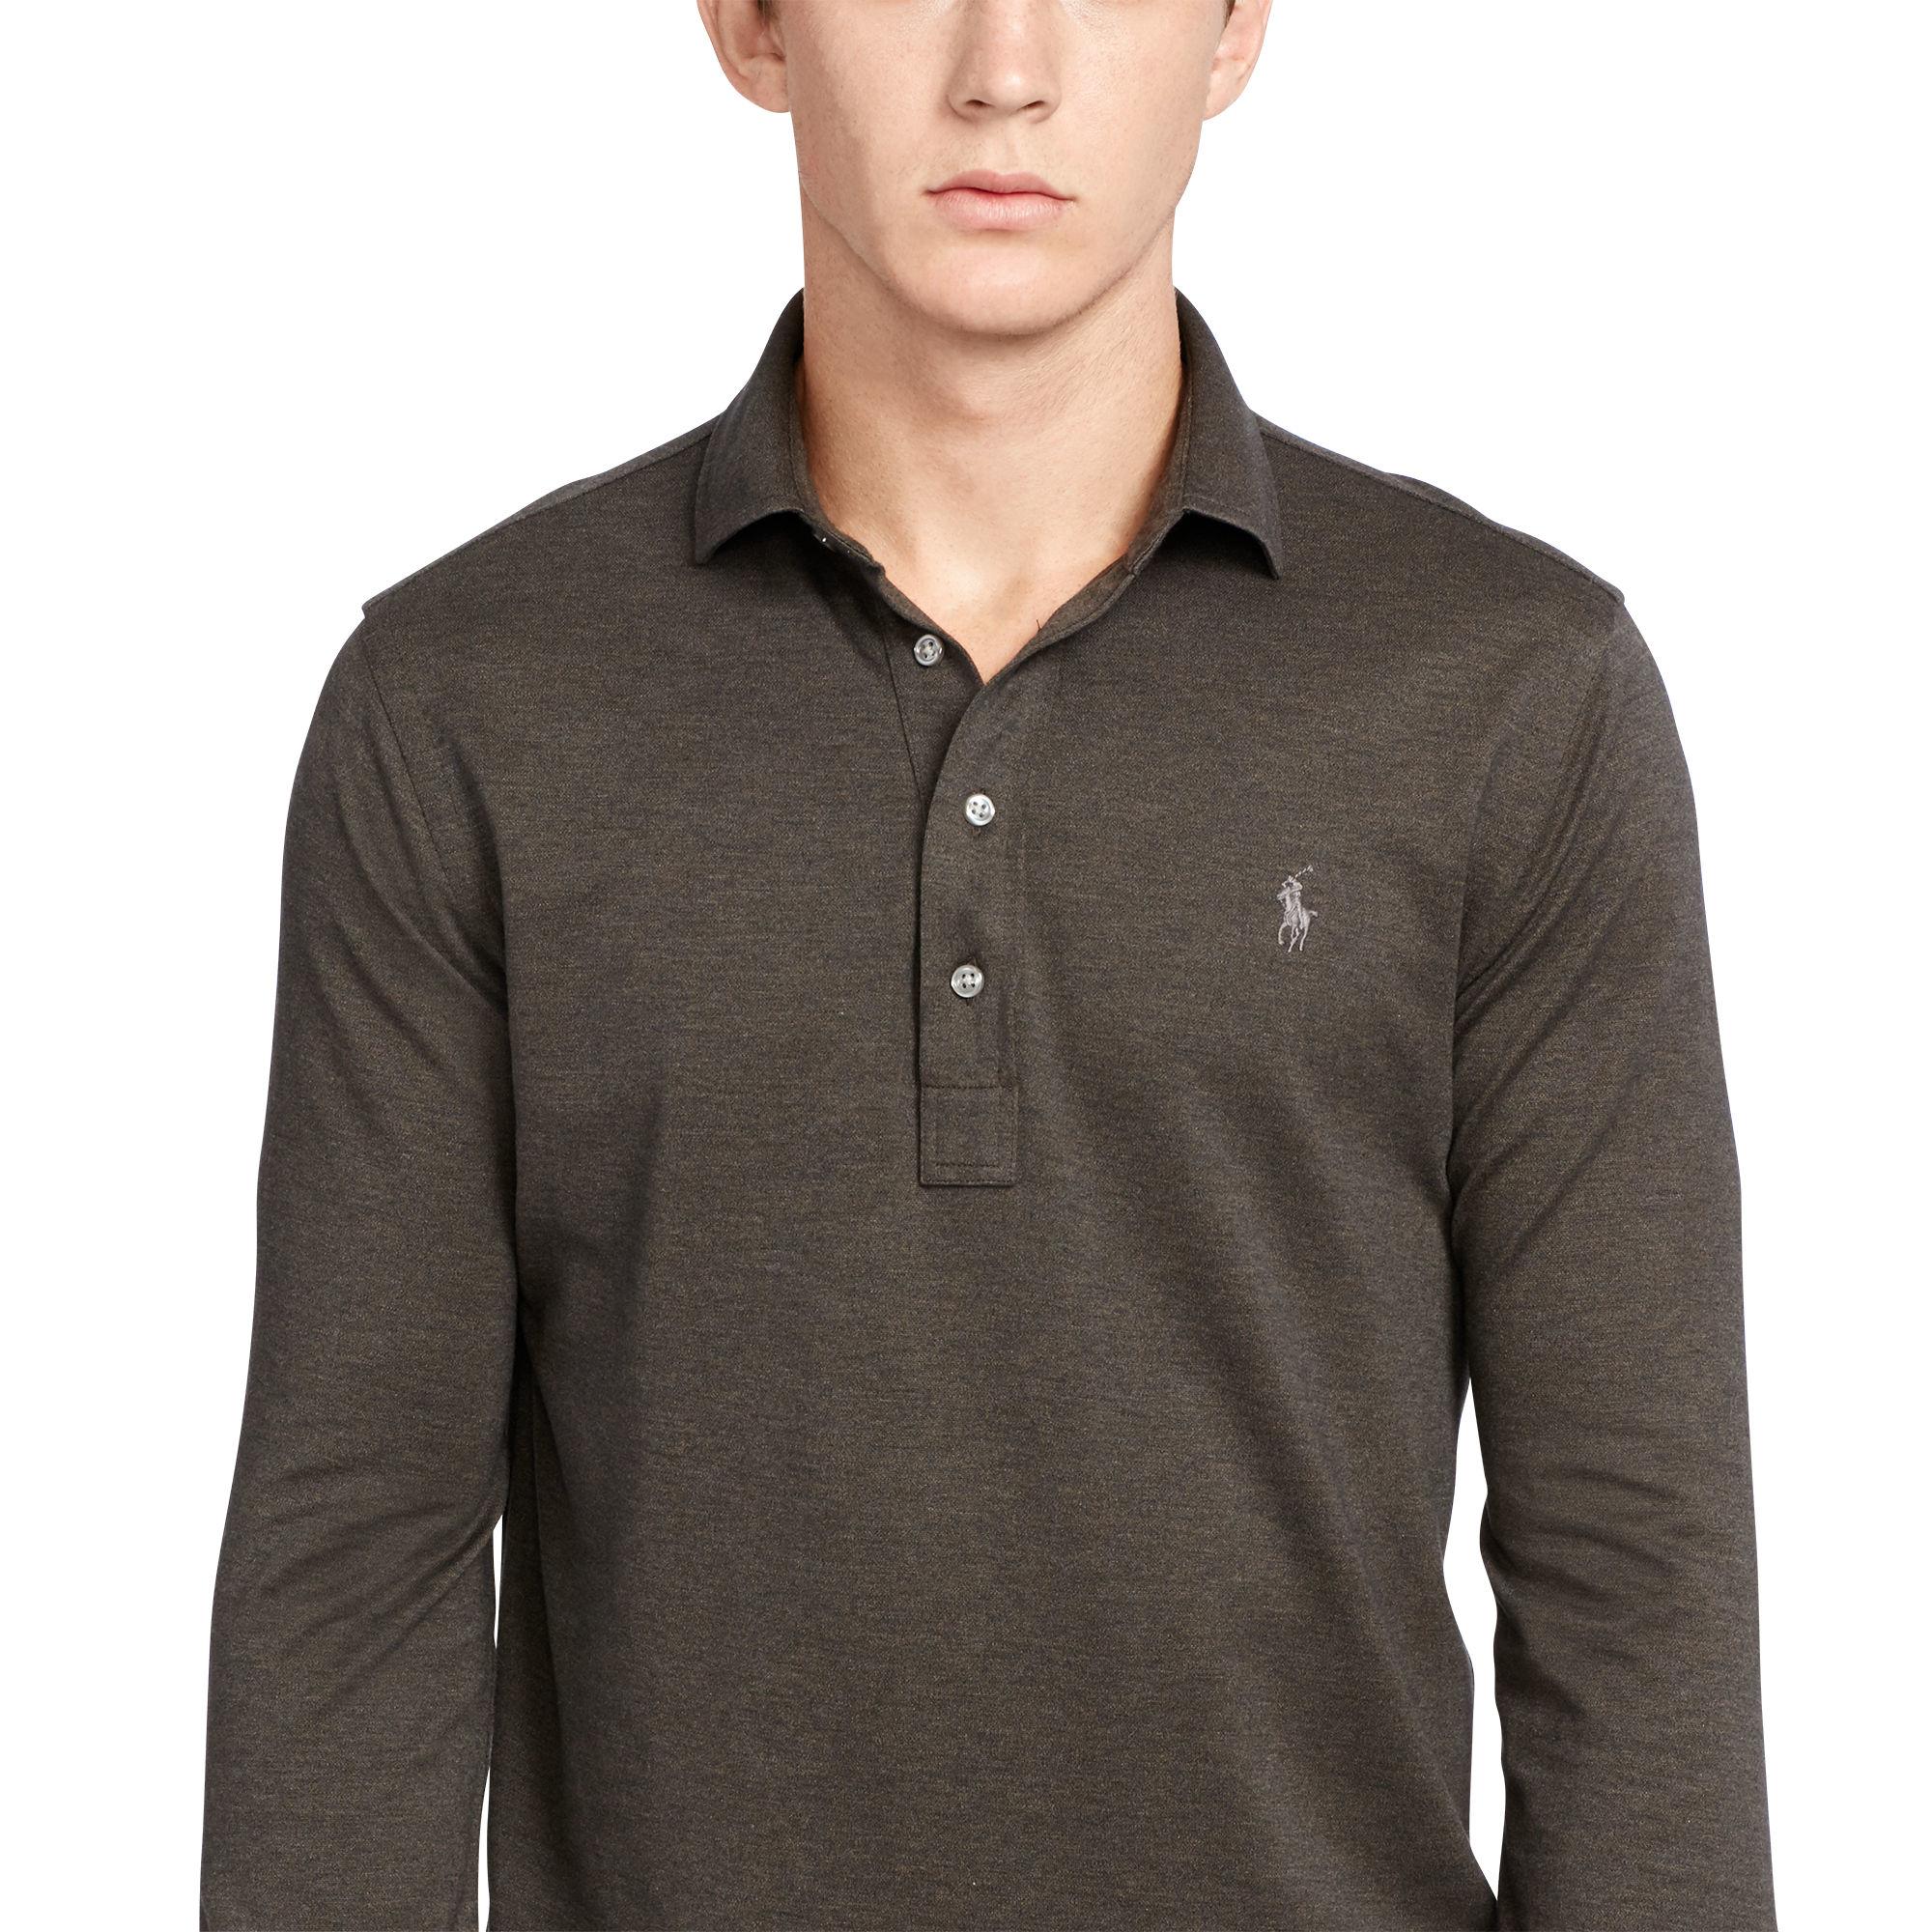 lyst polo ralph lauren baumwollhemd custom fit popover in gray for men. Black Bedroom Furniture Sets. Home Design Ideas